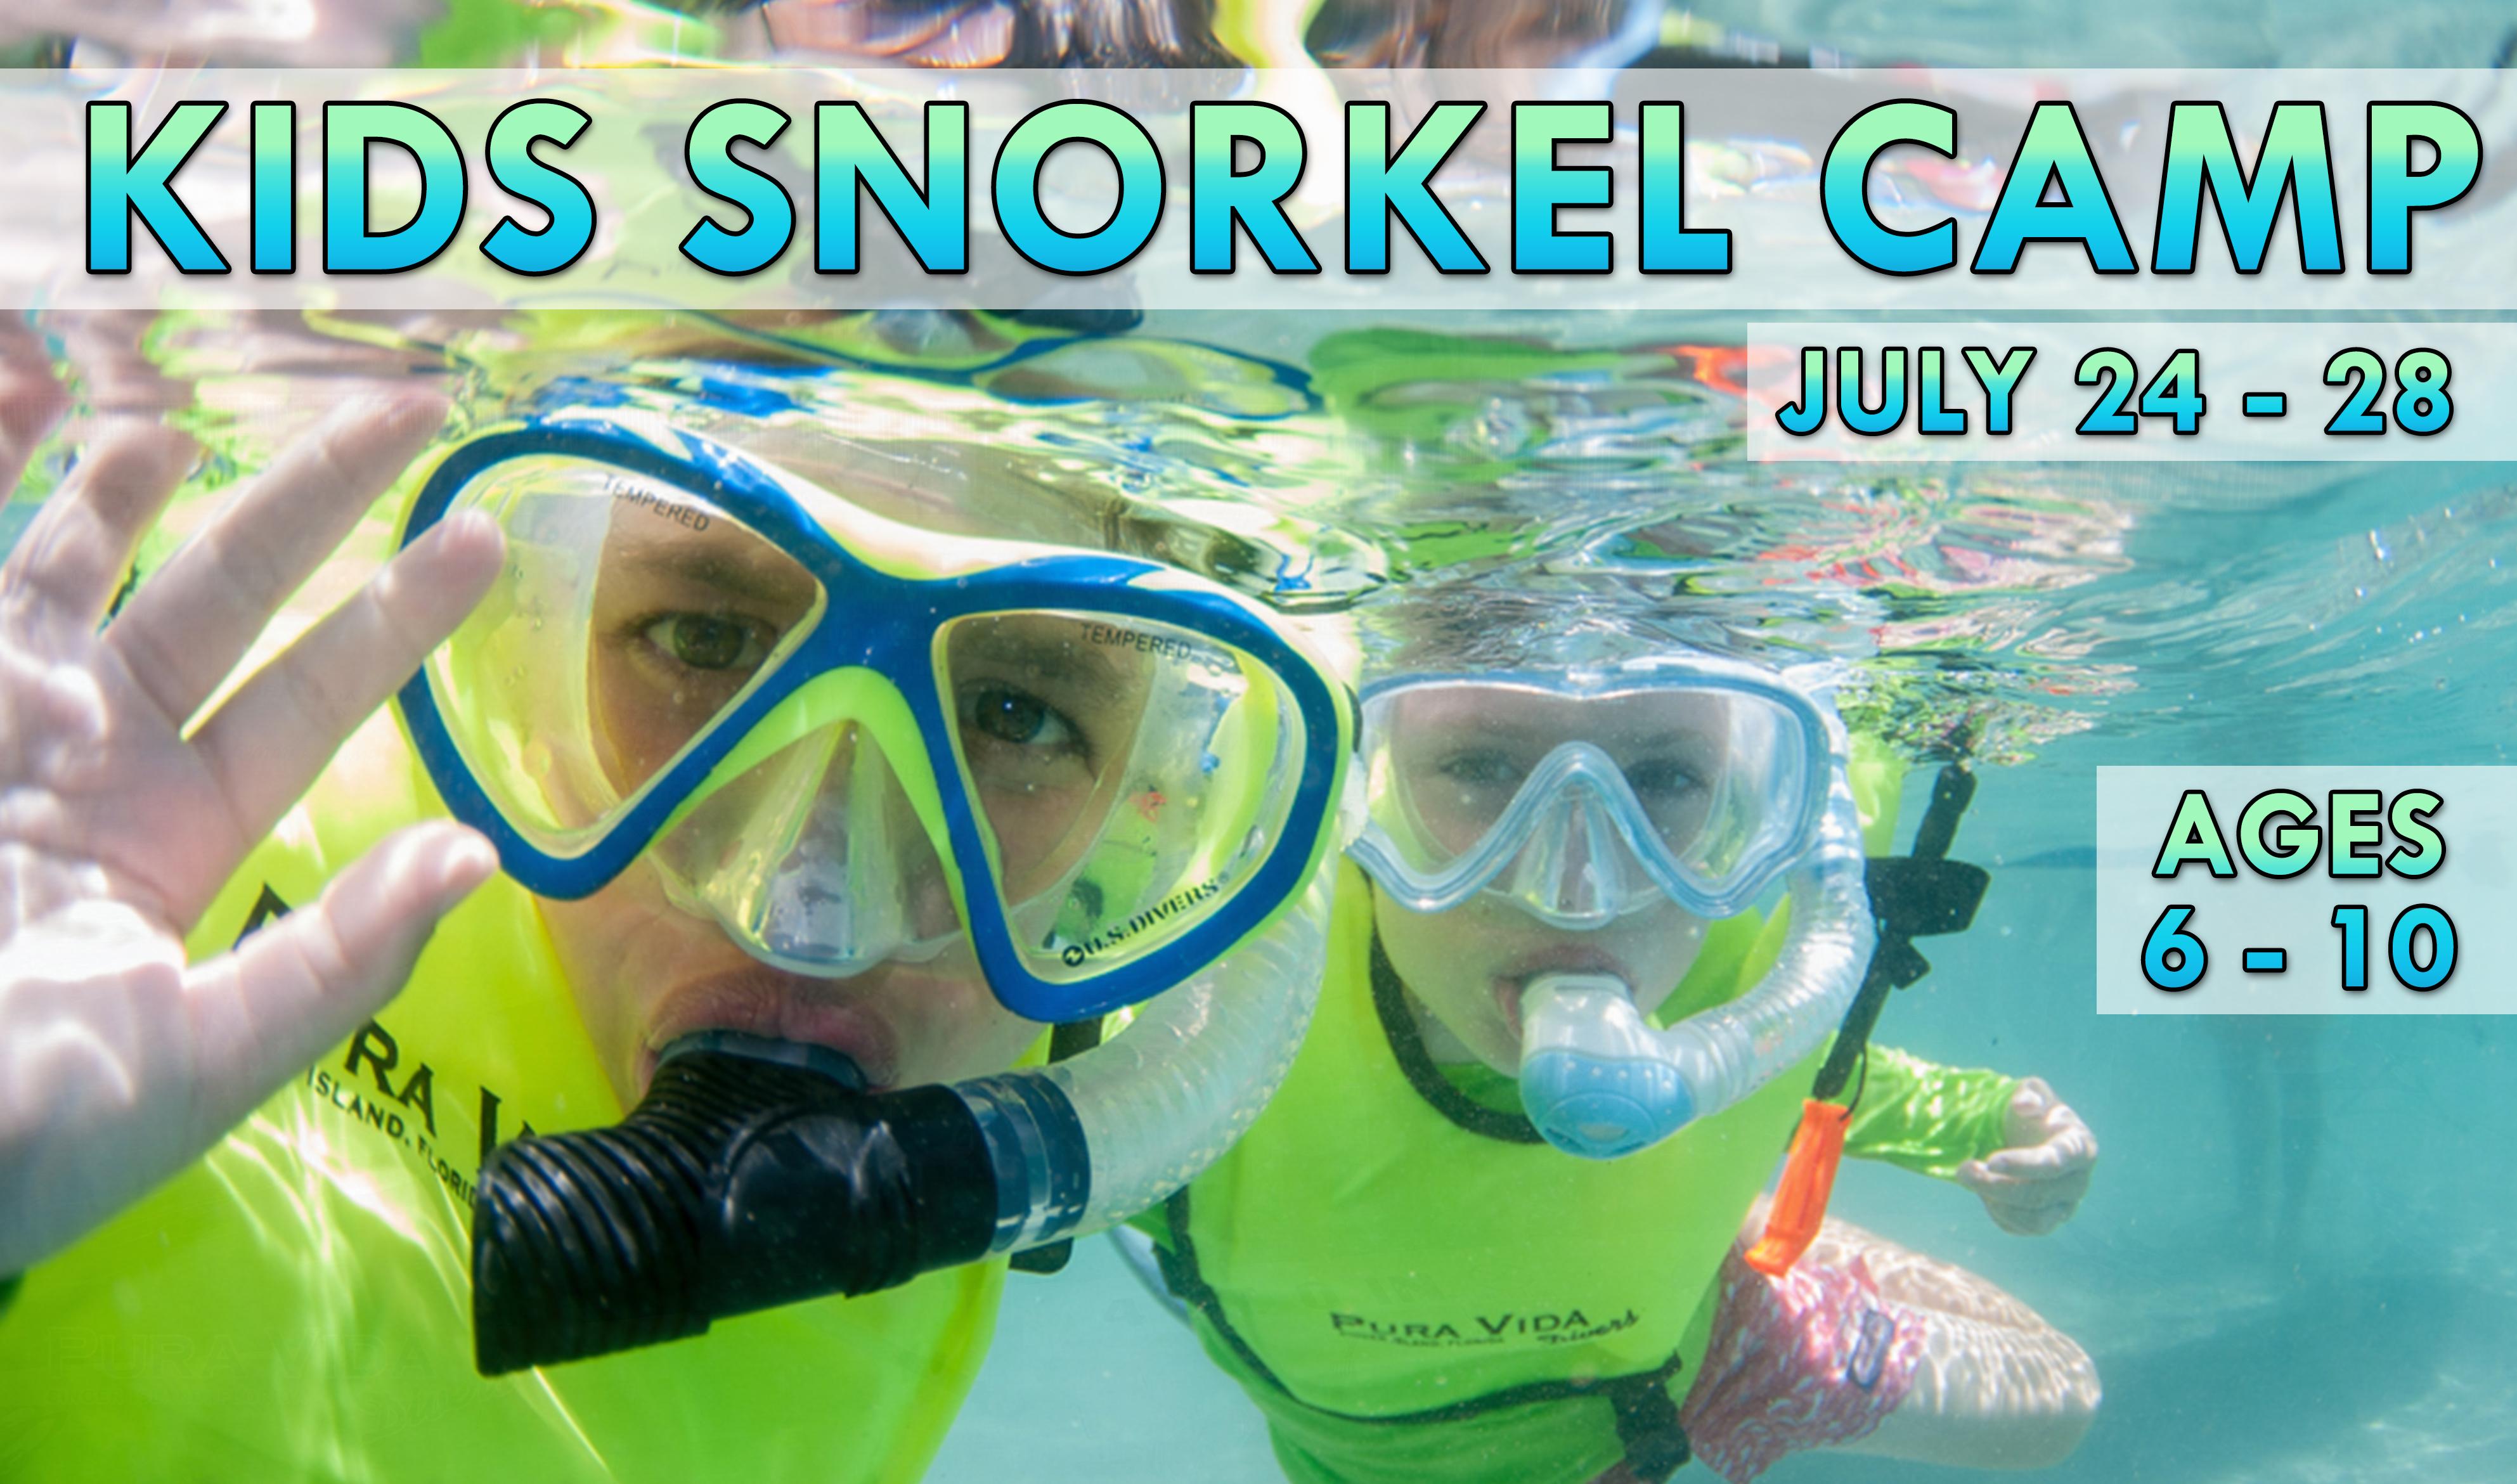 Pura vida divers discover south florida scuba diving summer snorkel camp xflitez Images